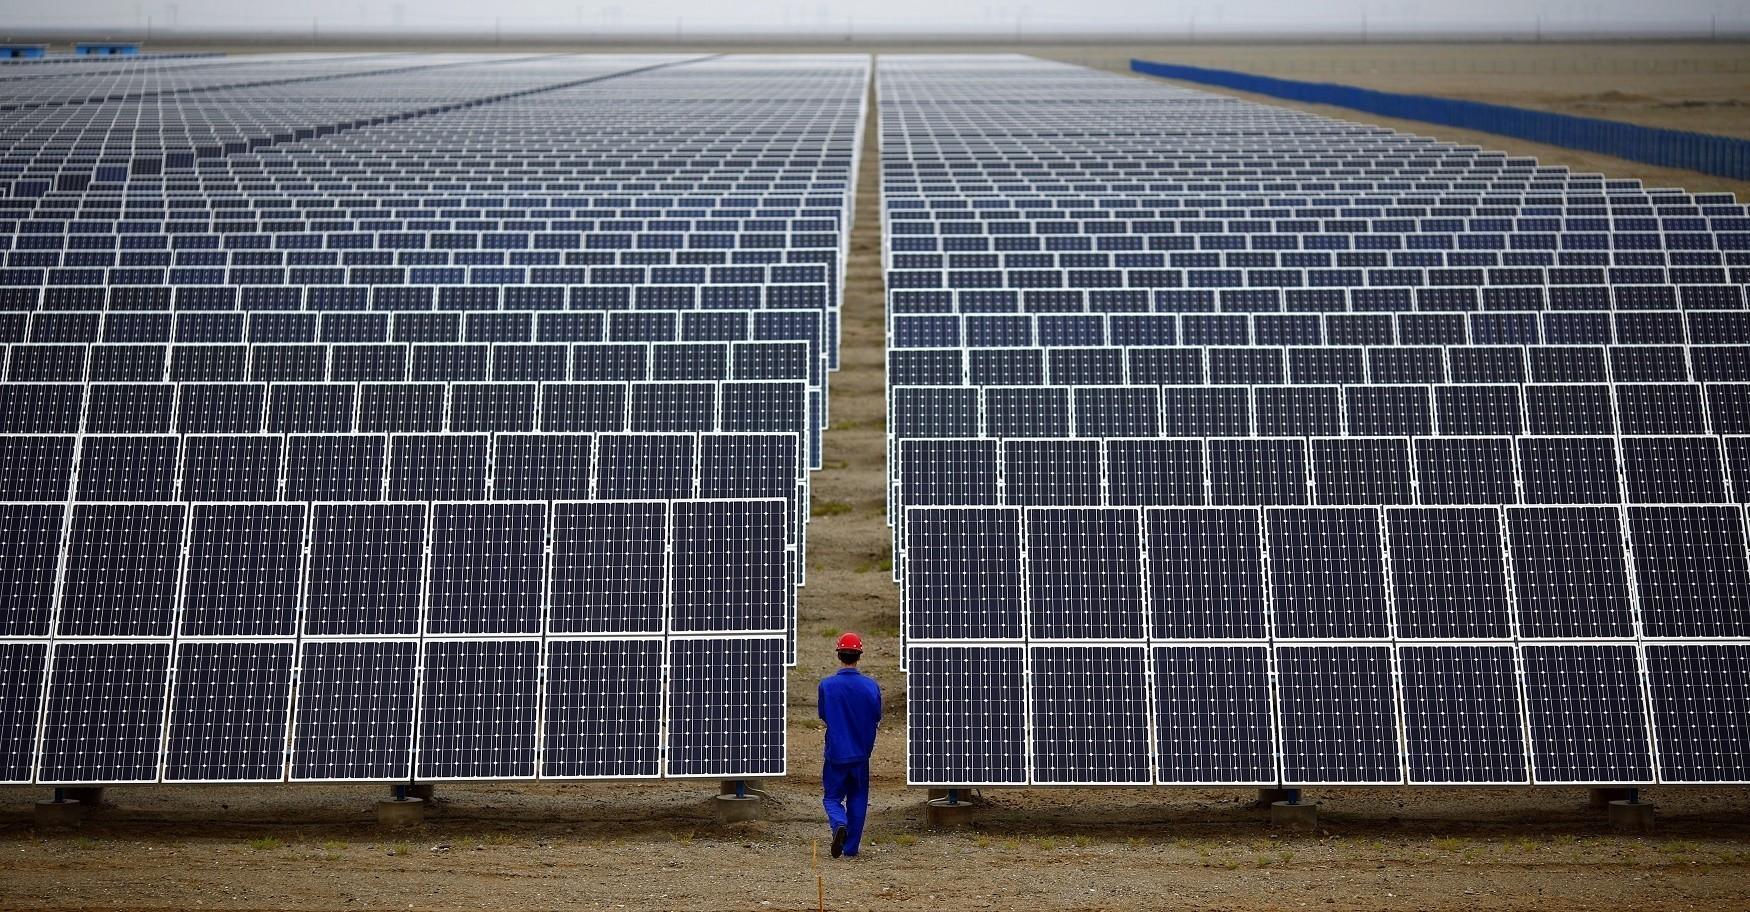 The unexpected challenges of solar power | World Economic Forum